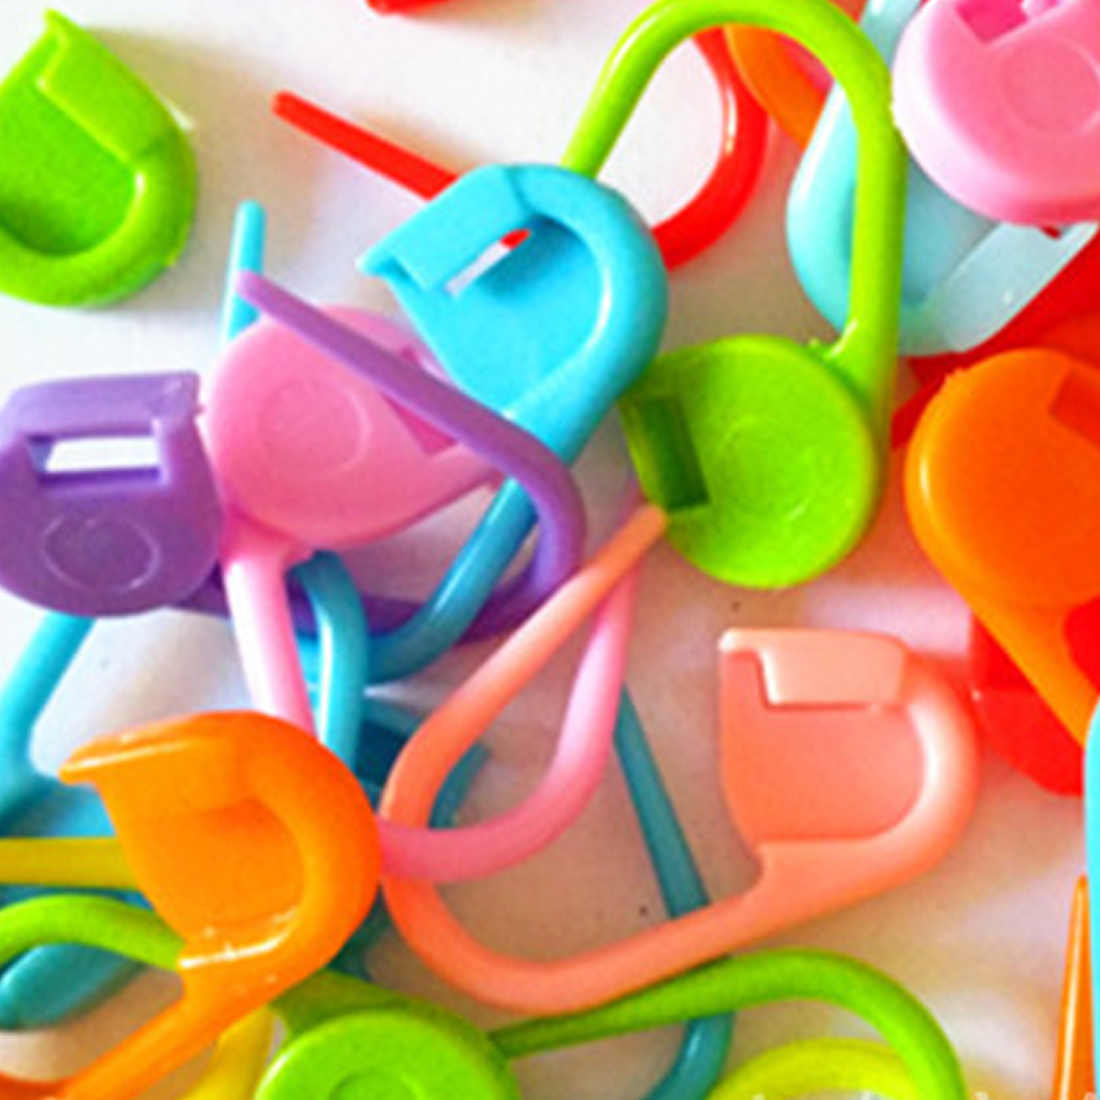 20/50 Buah 22 Mm Plastik Keselamatan Pin Sweater Mark Gesper Jarum Rajut Khusus Bayi Benang DIY Tenun alat